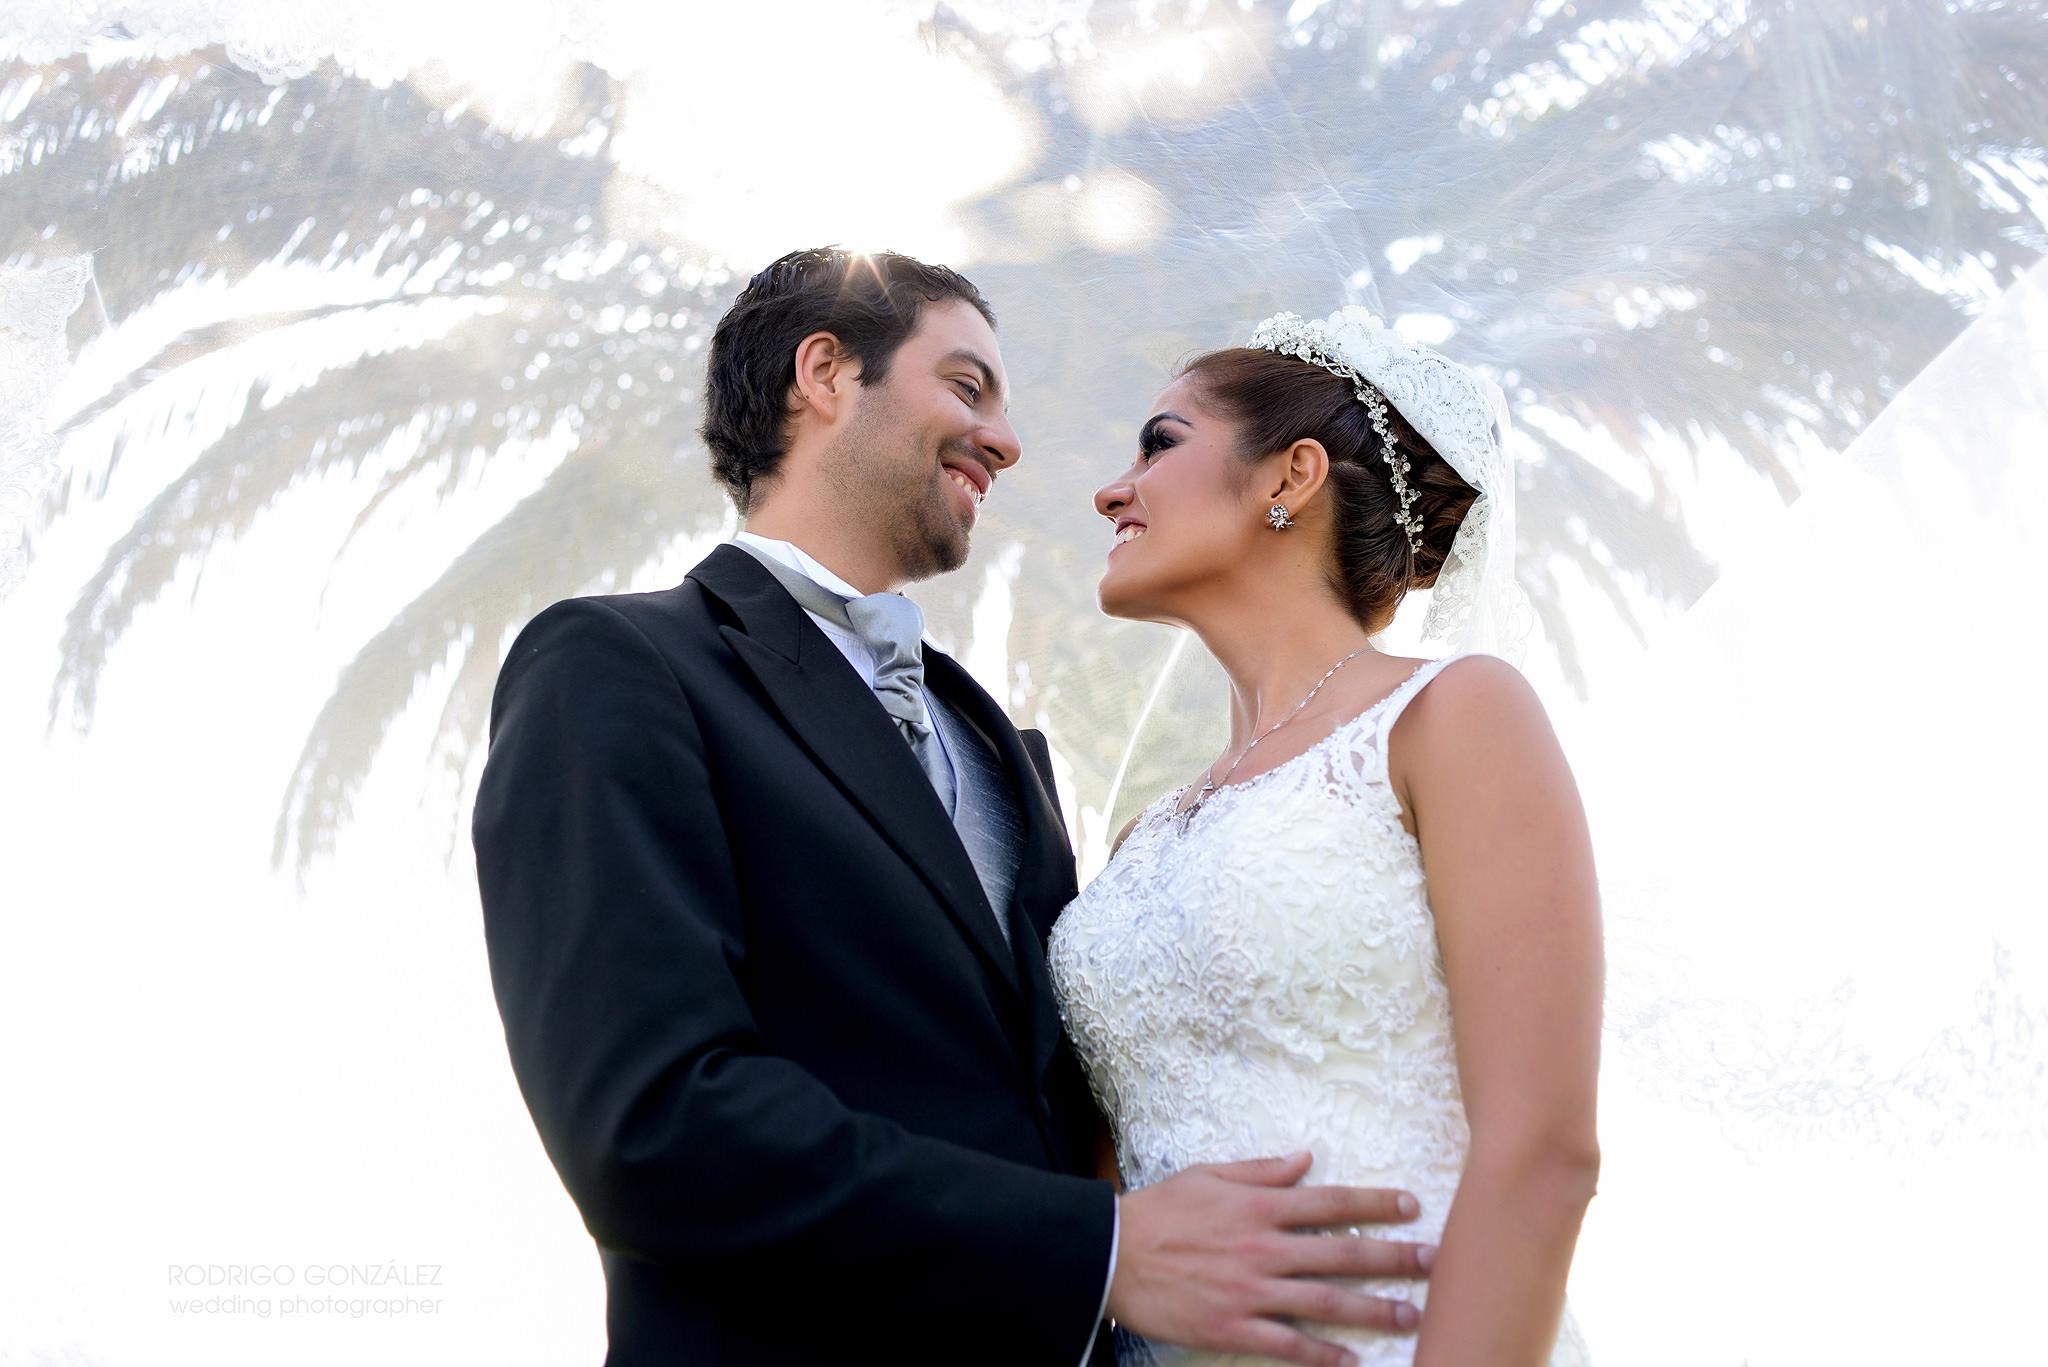 fotografo-de-bodas-en-haciendas-0378